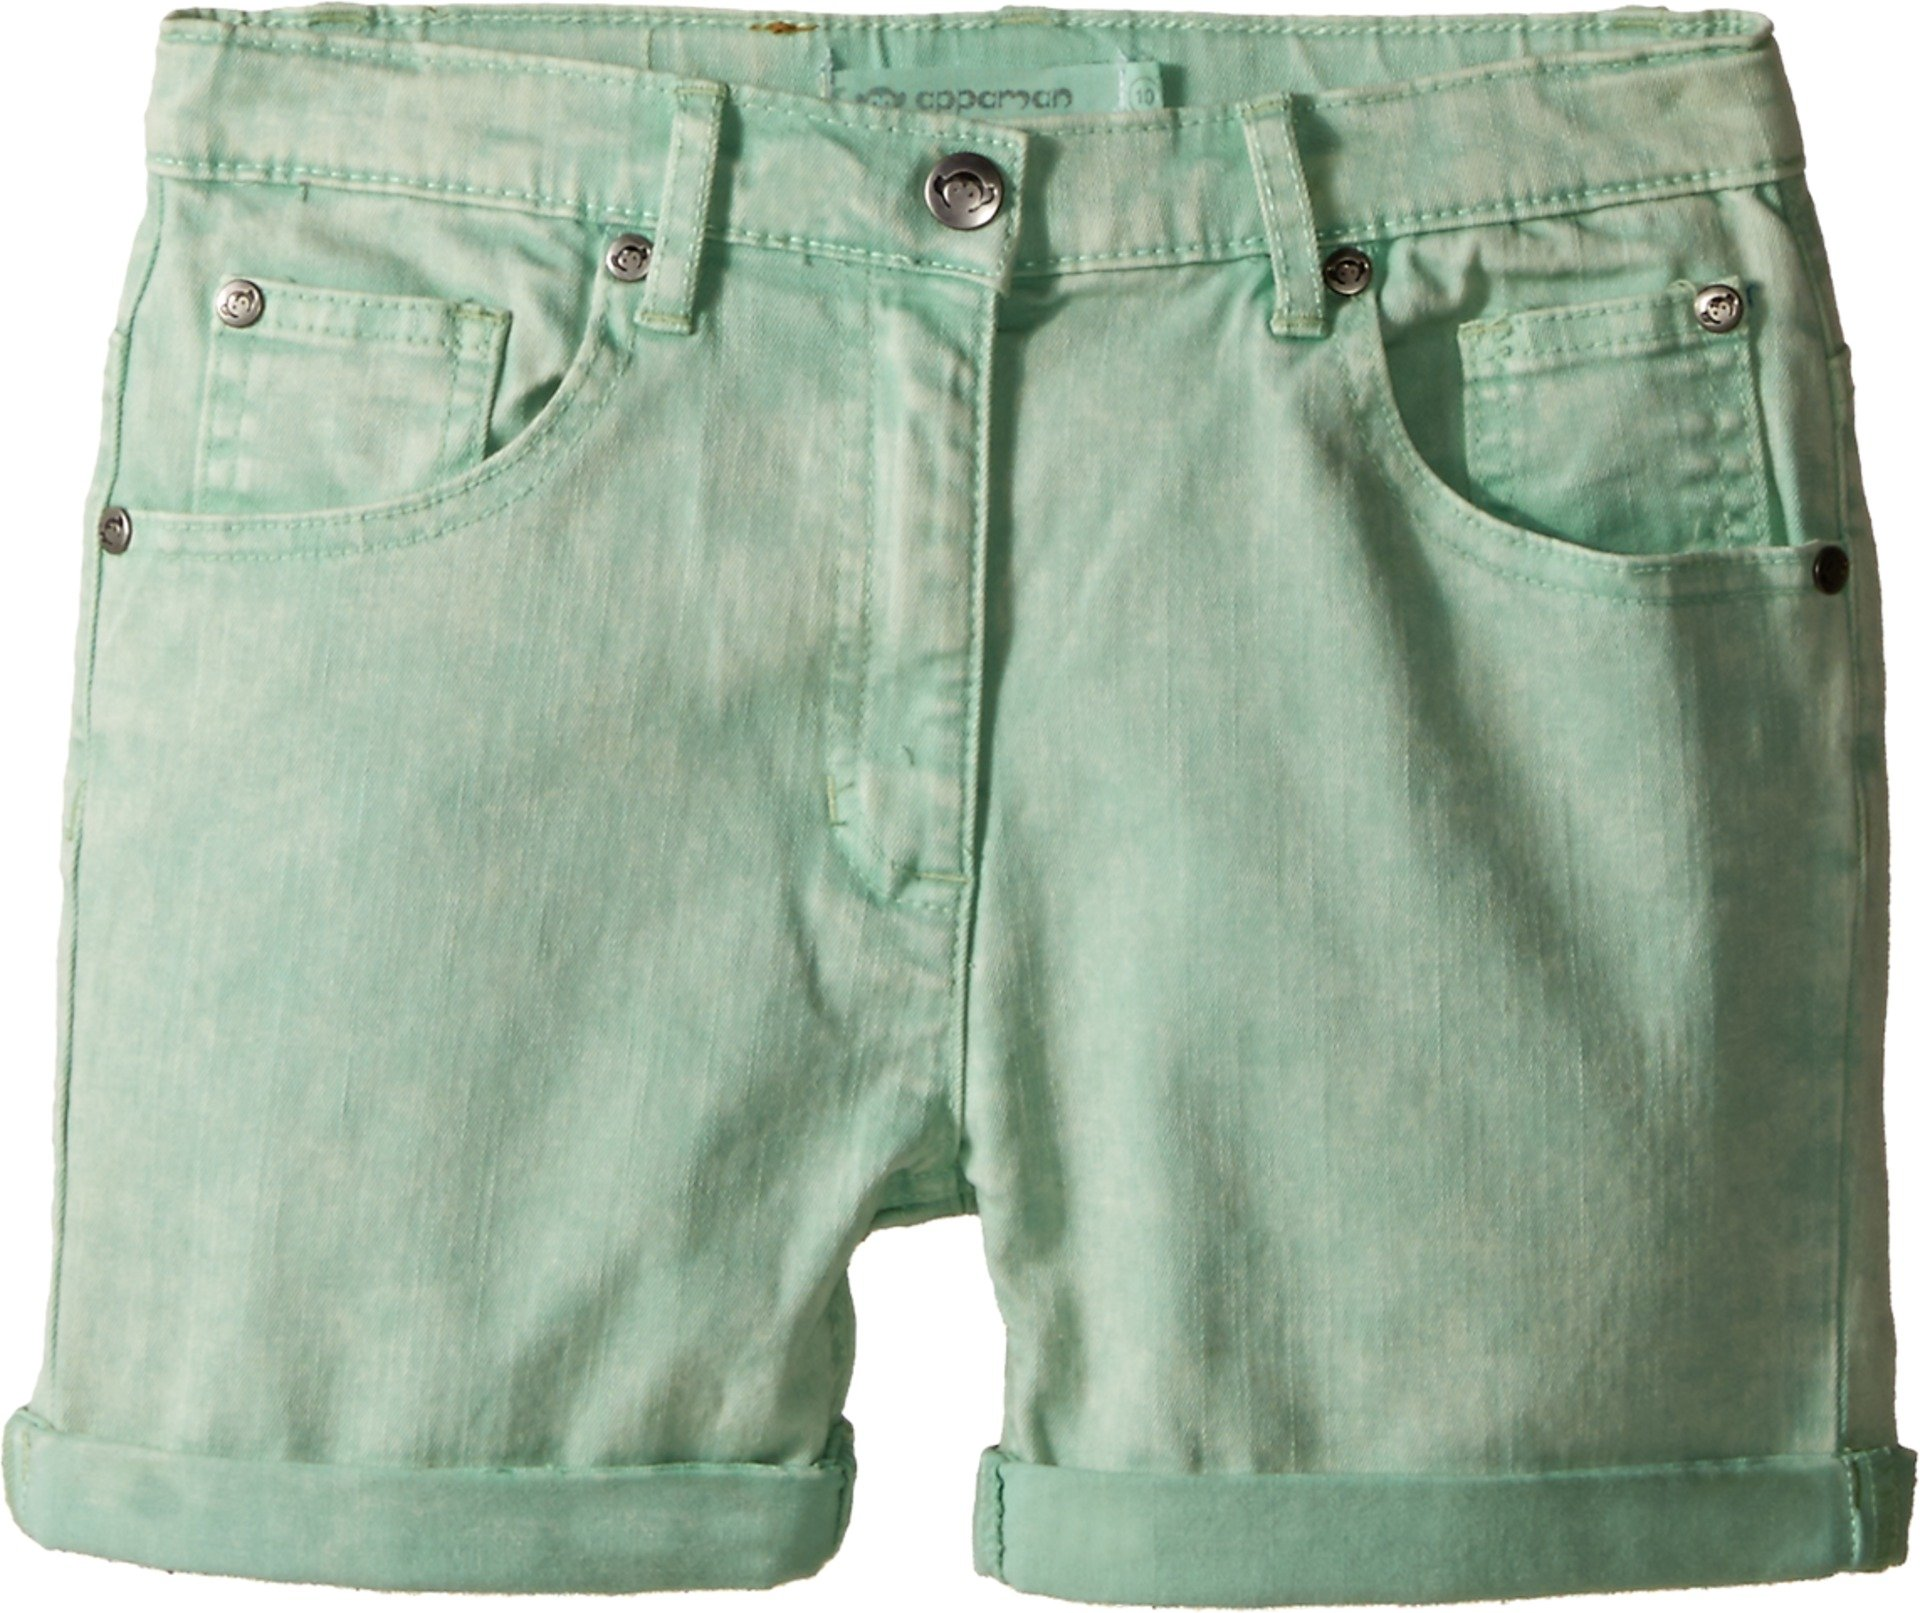 Appaman Kids Baby Girl's Super Soft Roll Cuff York Chalk Denim Shorts (Toddler/Little Kids/Big Kids) Pastel Green Shorts